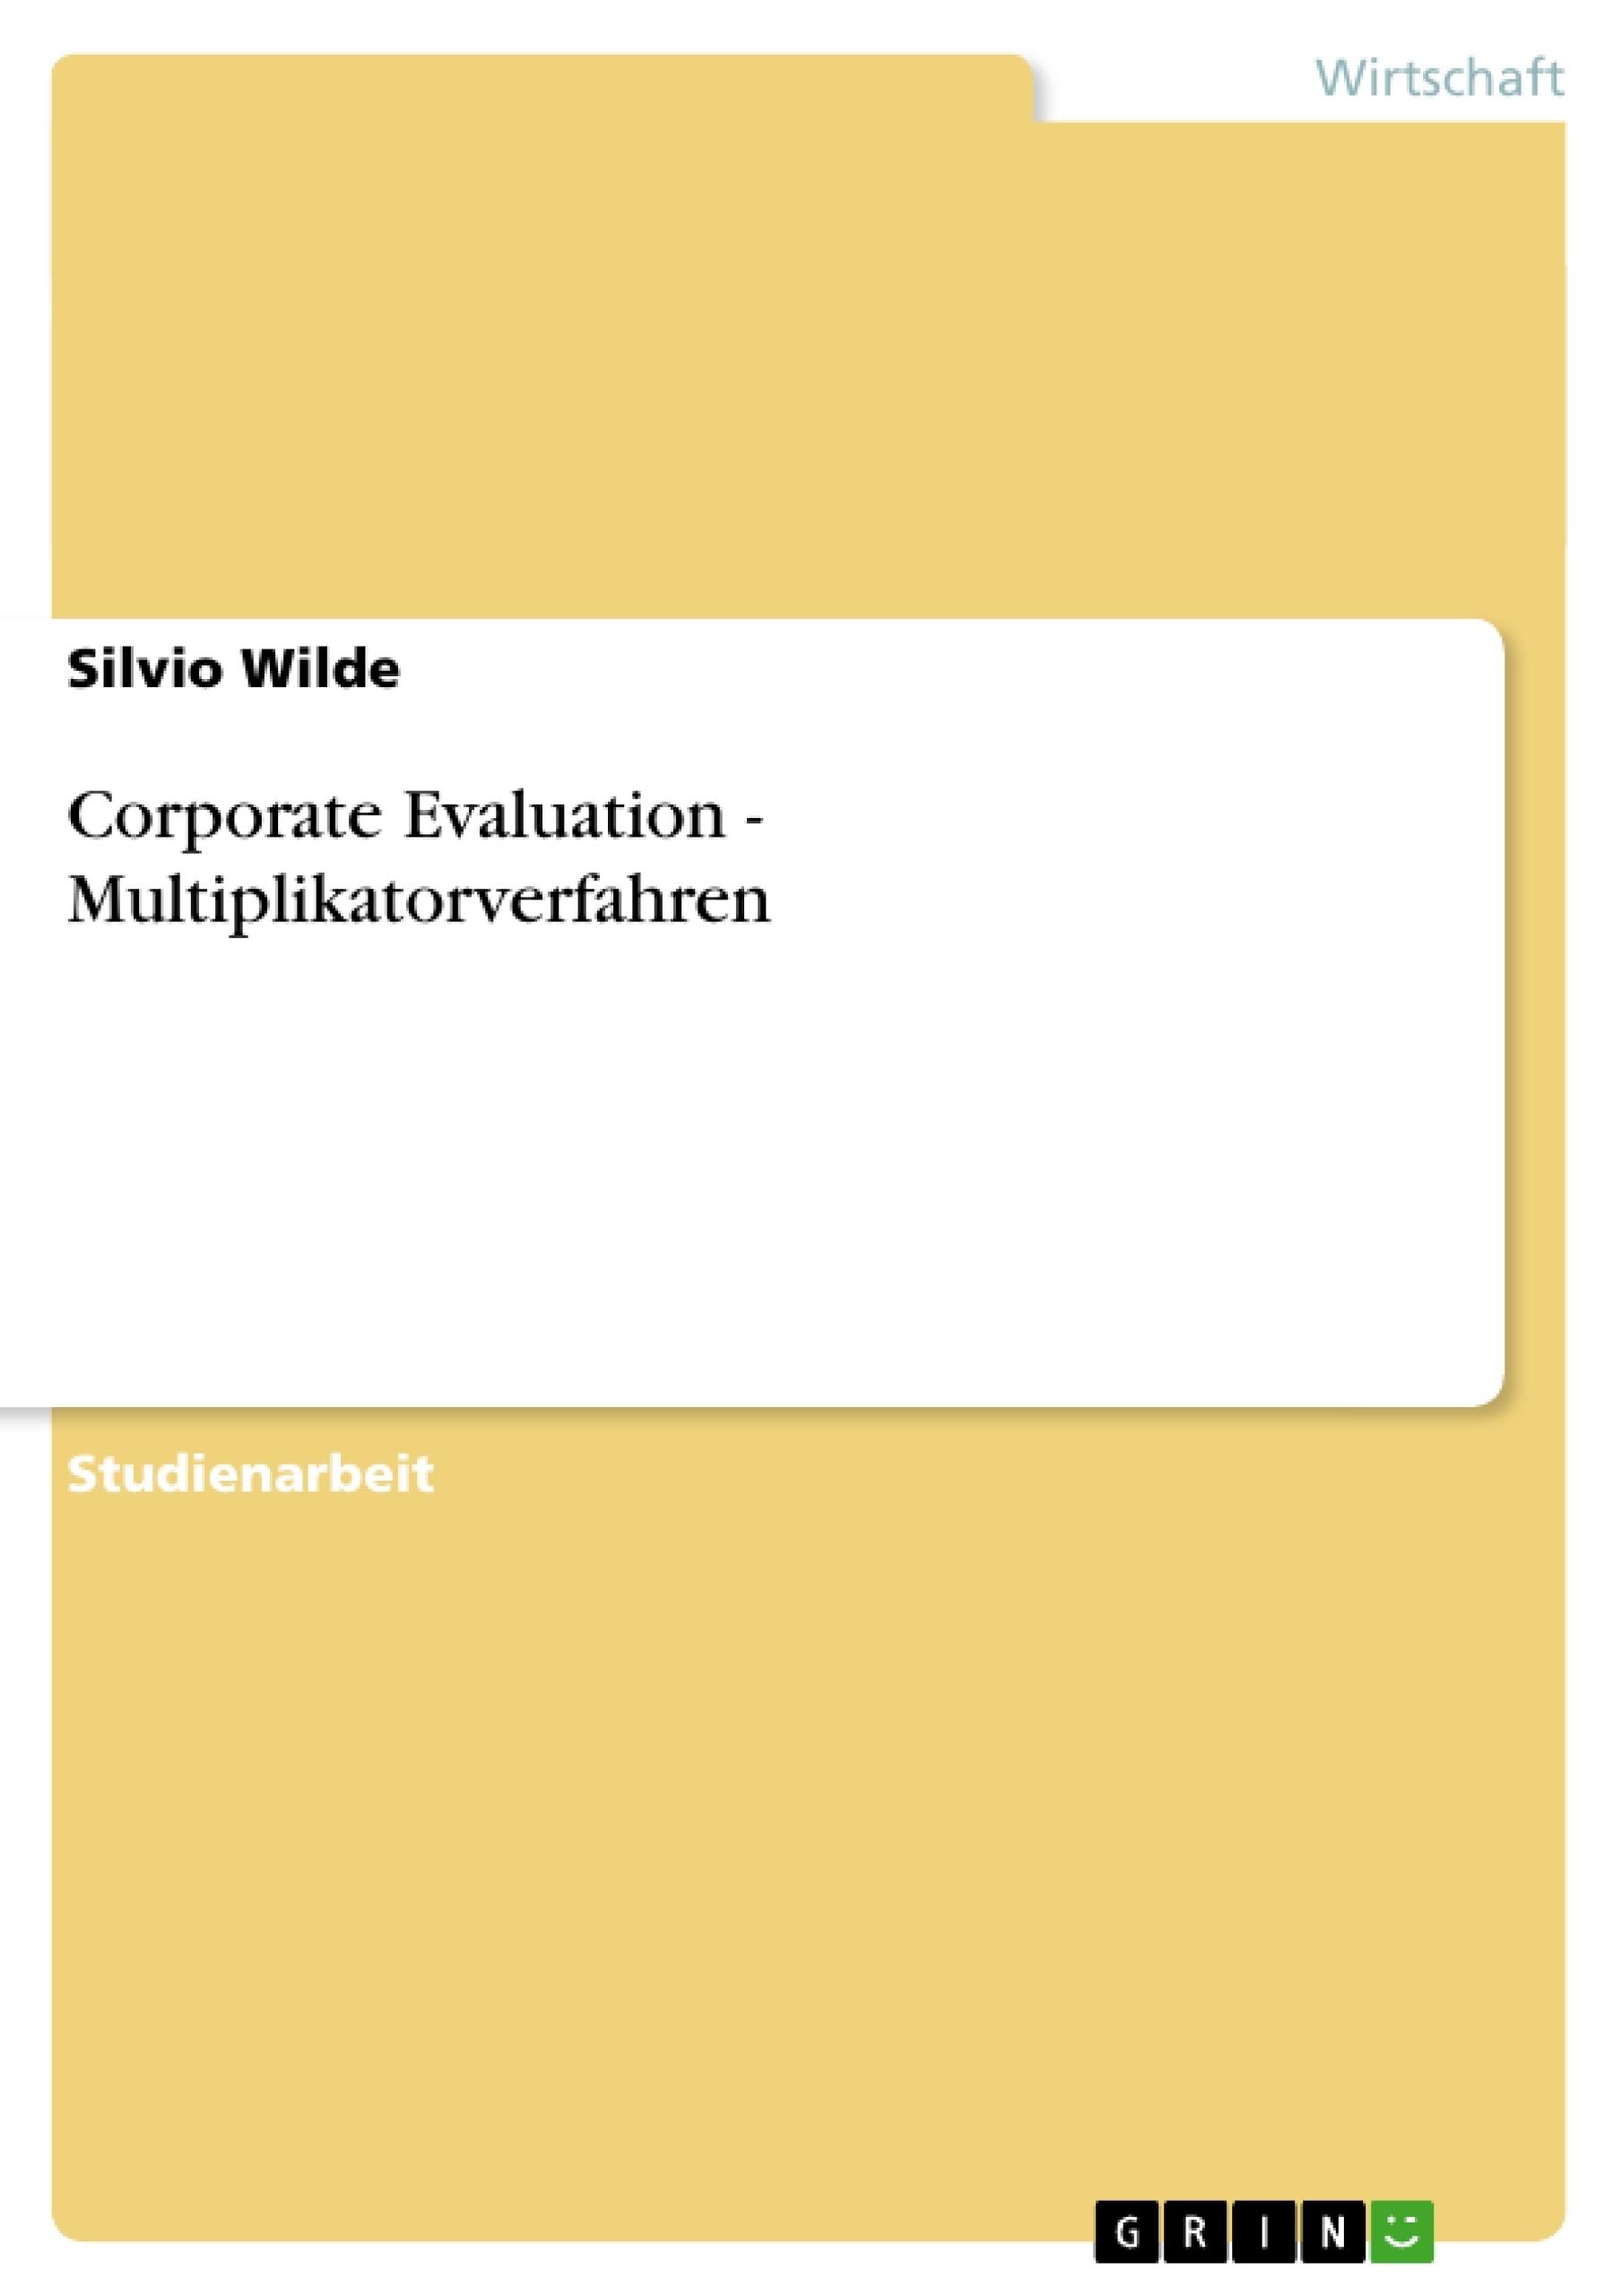 Titel: Corporate Evaluation - Multiplikatorverfahren